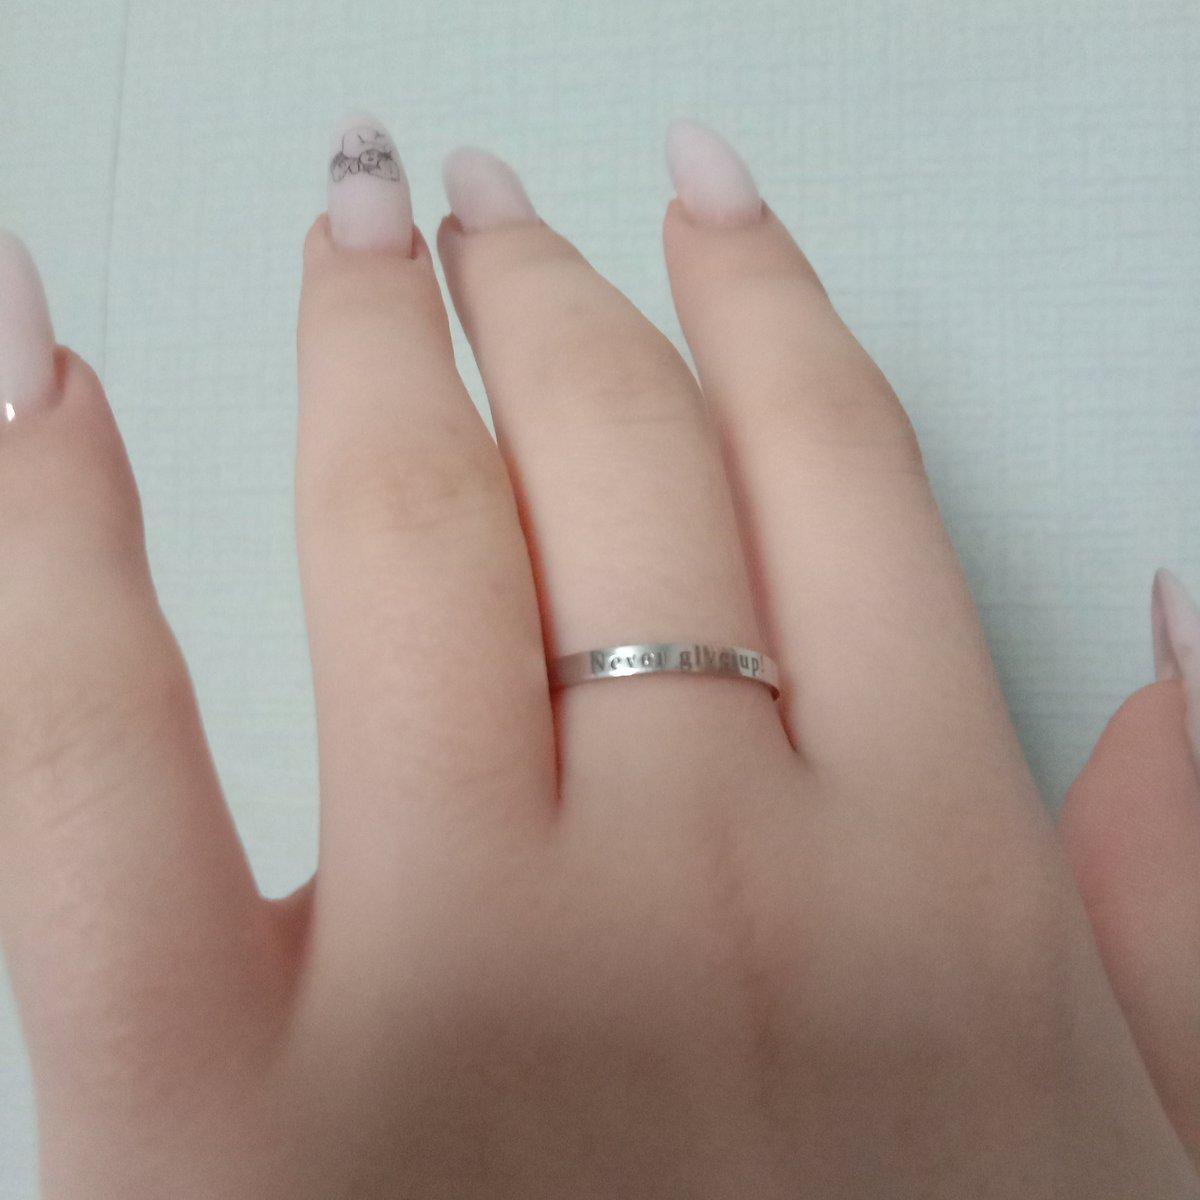 Покупала серебряное кольцо